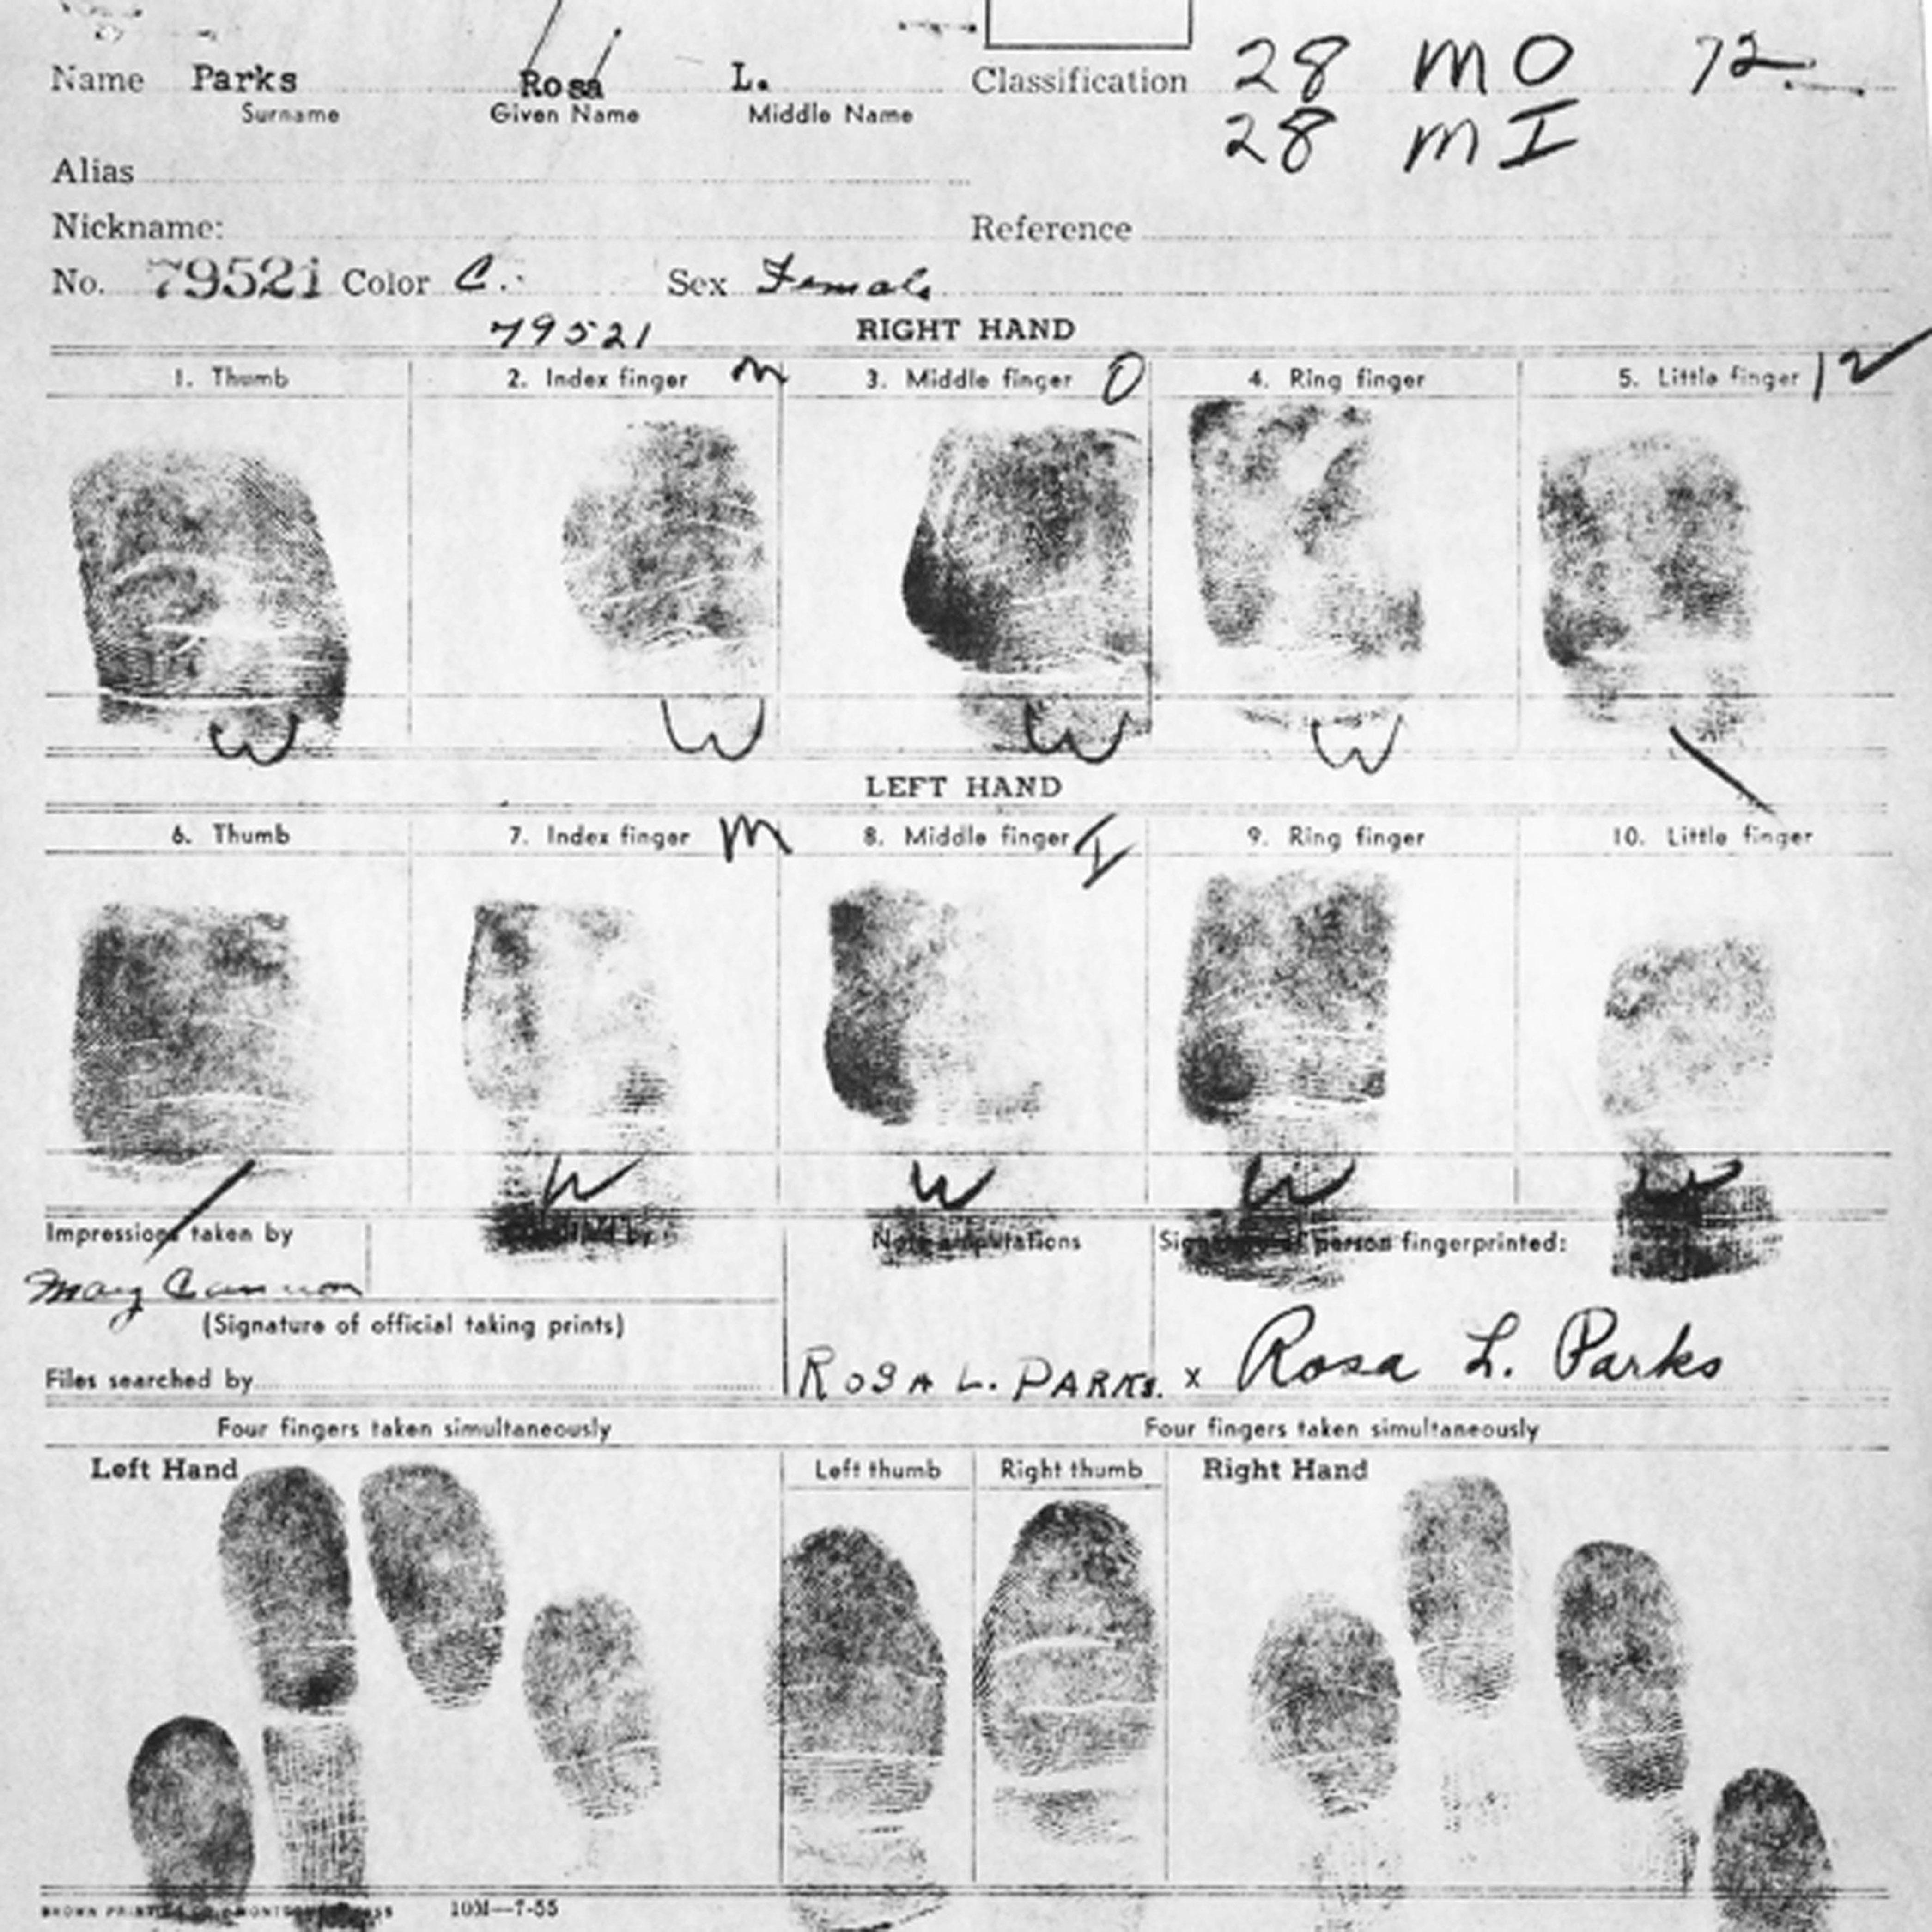 Fingerprint Card of Rosa Parks Civil Case